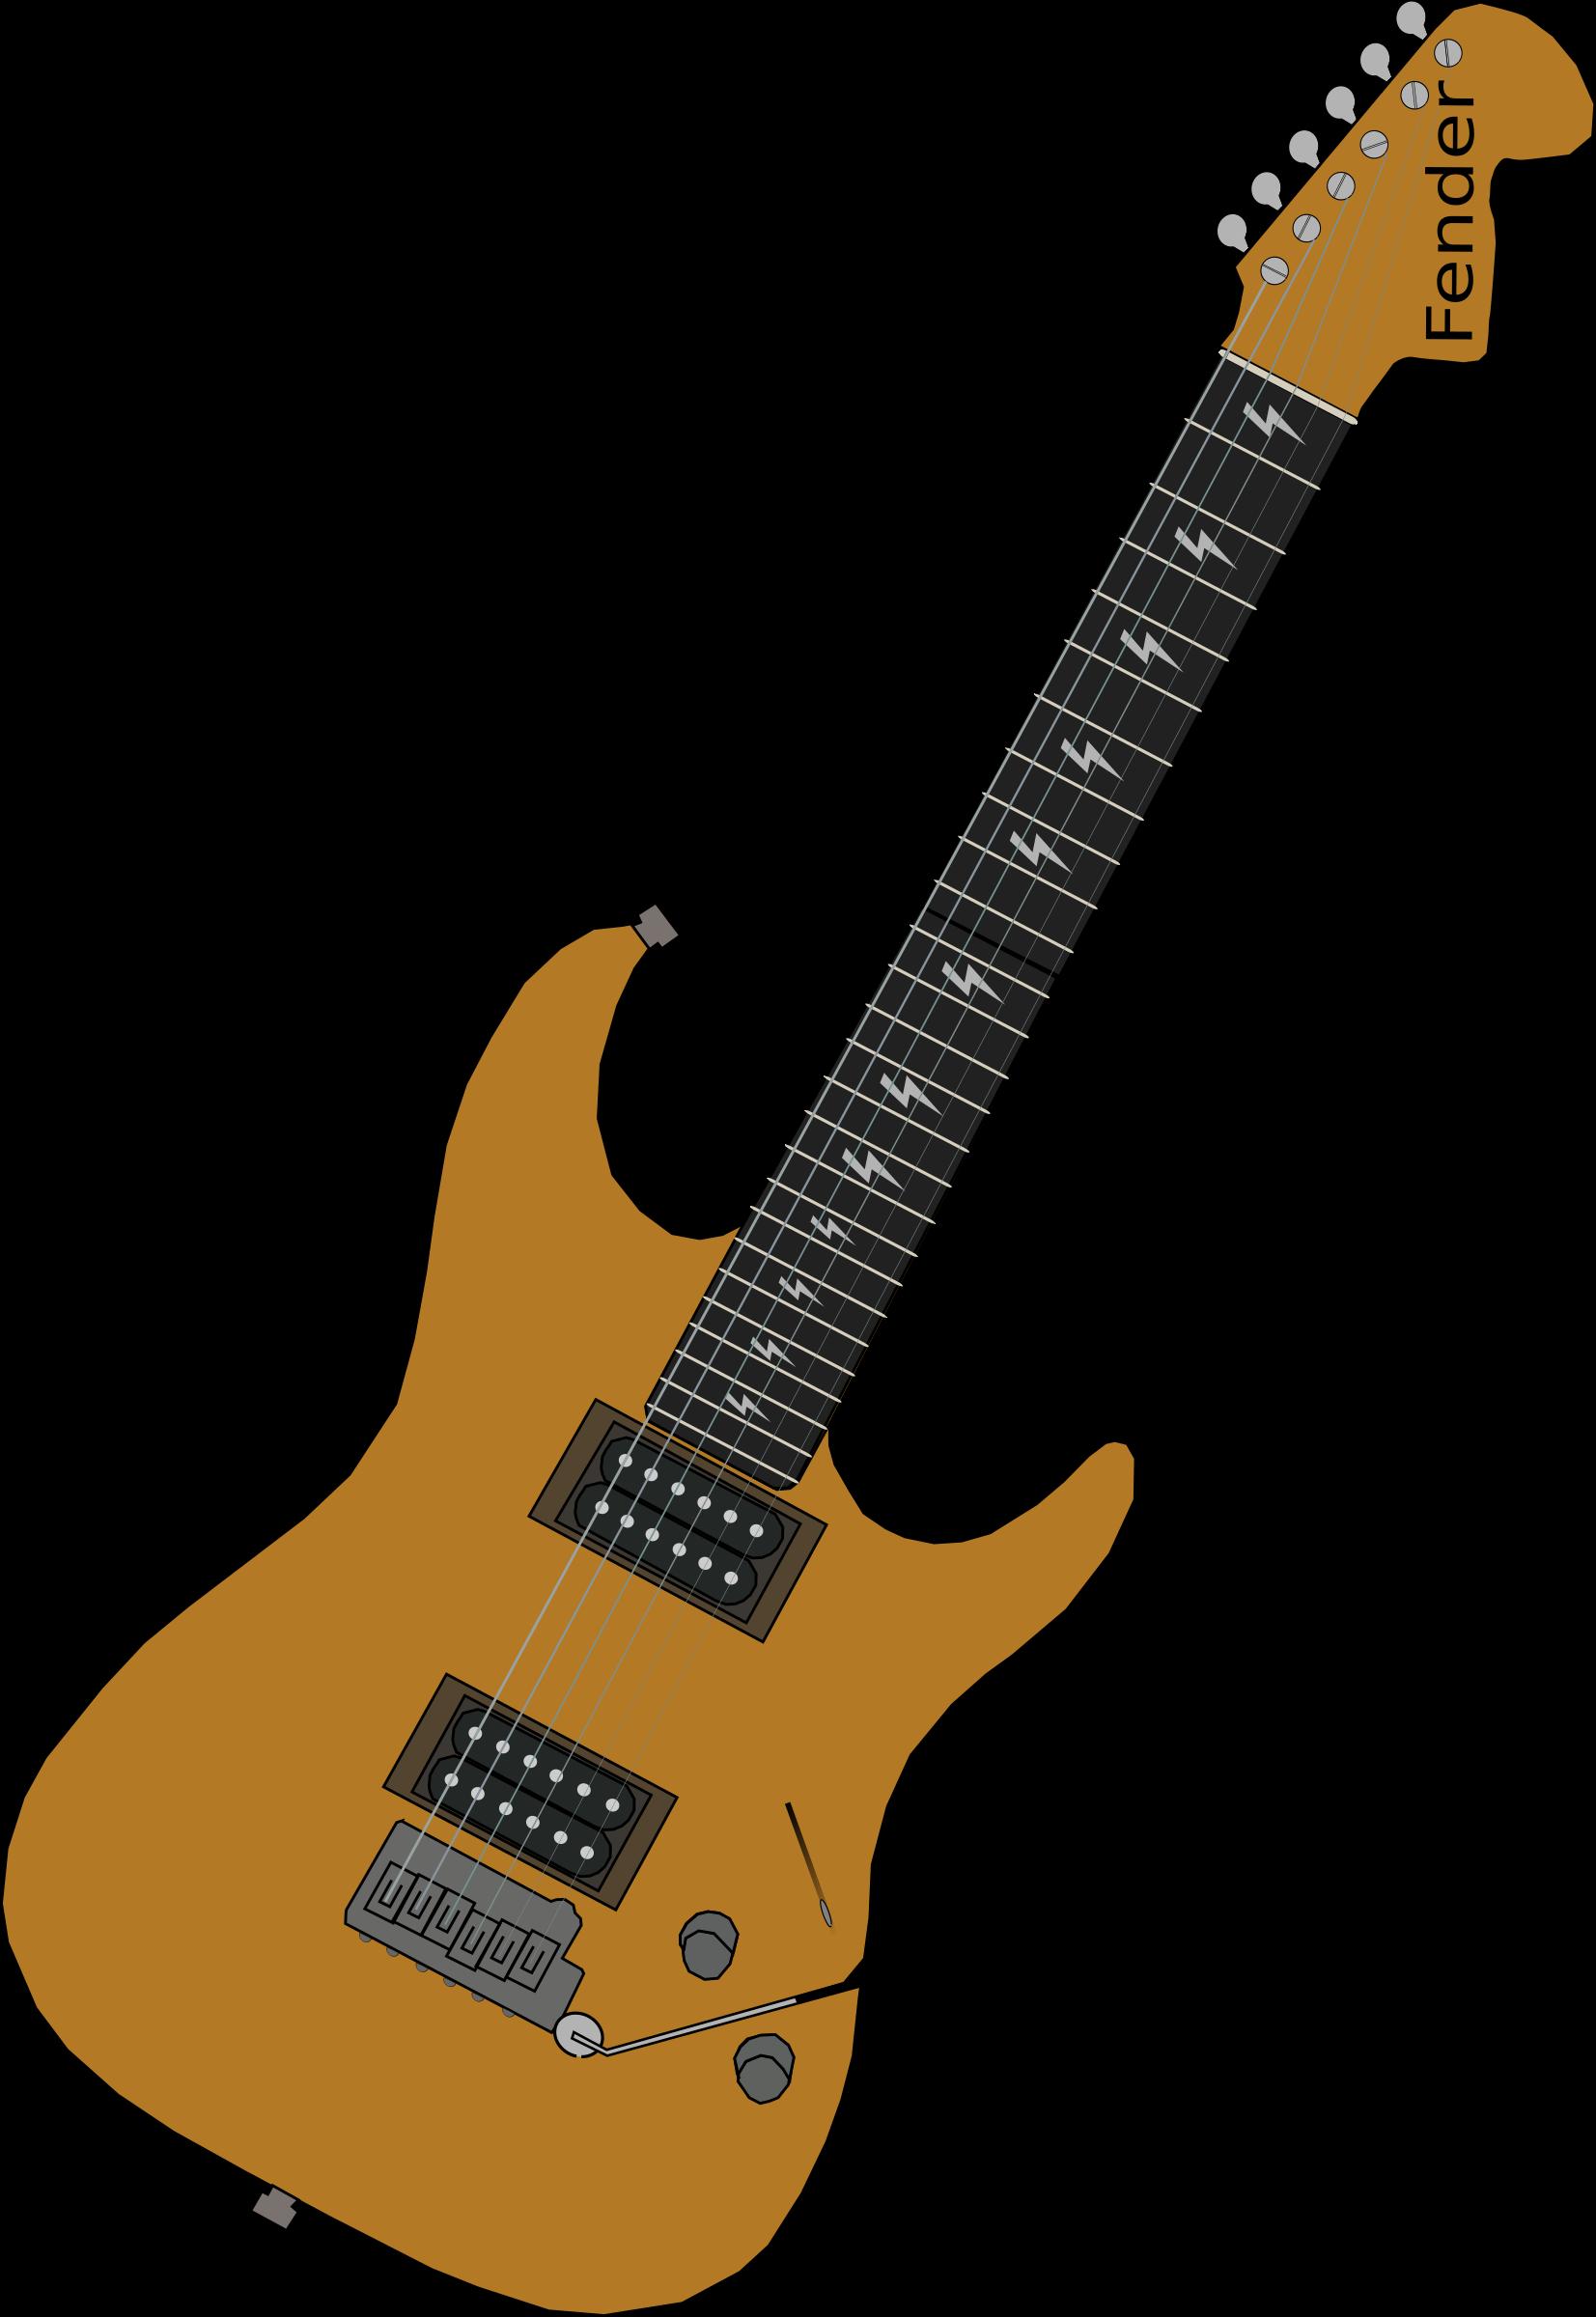 . Clipart guitar cool guitar